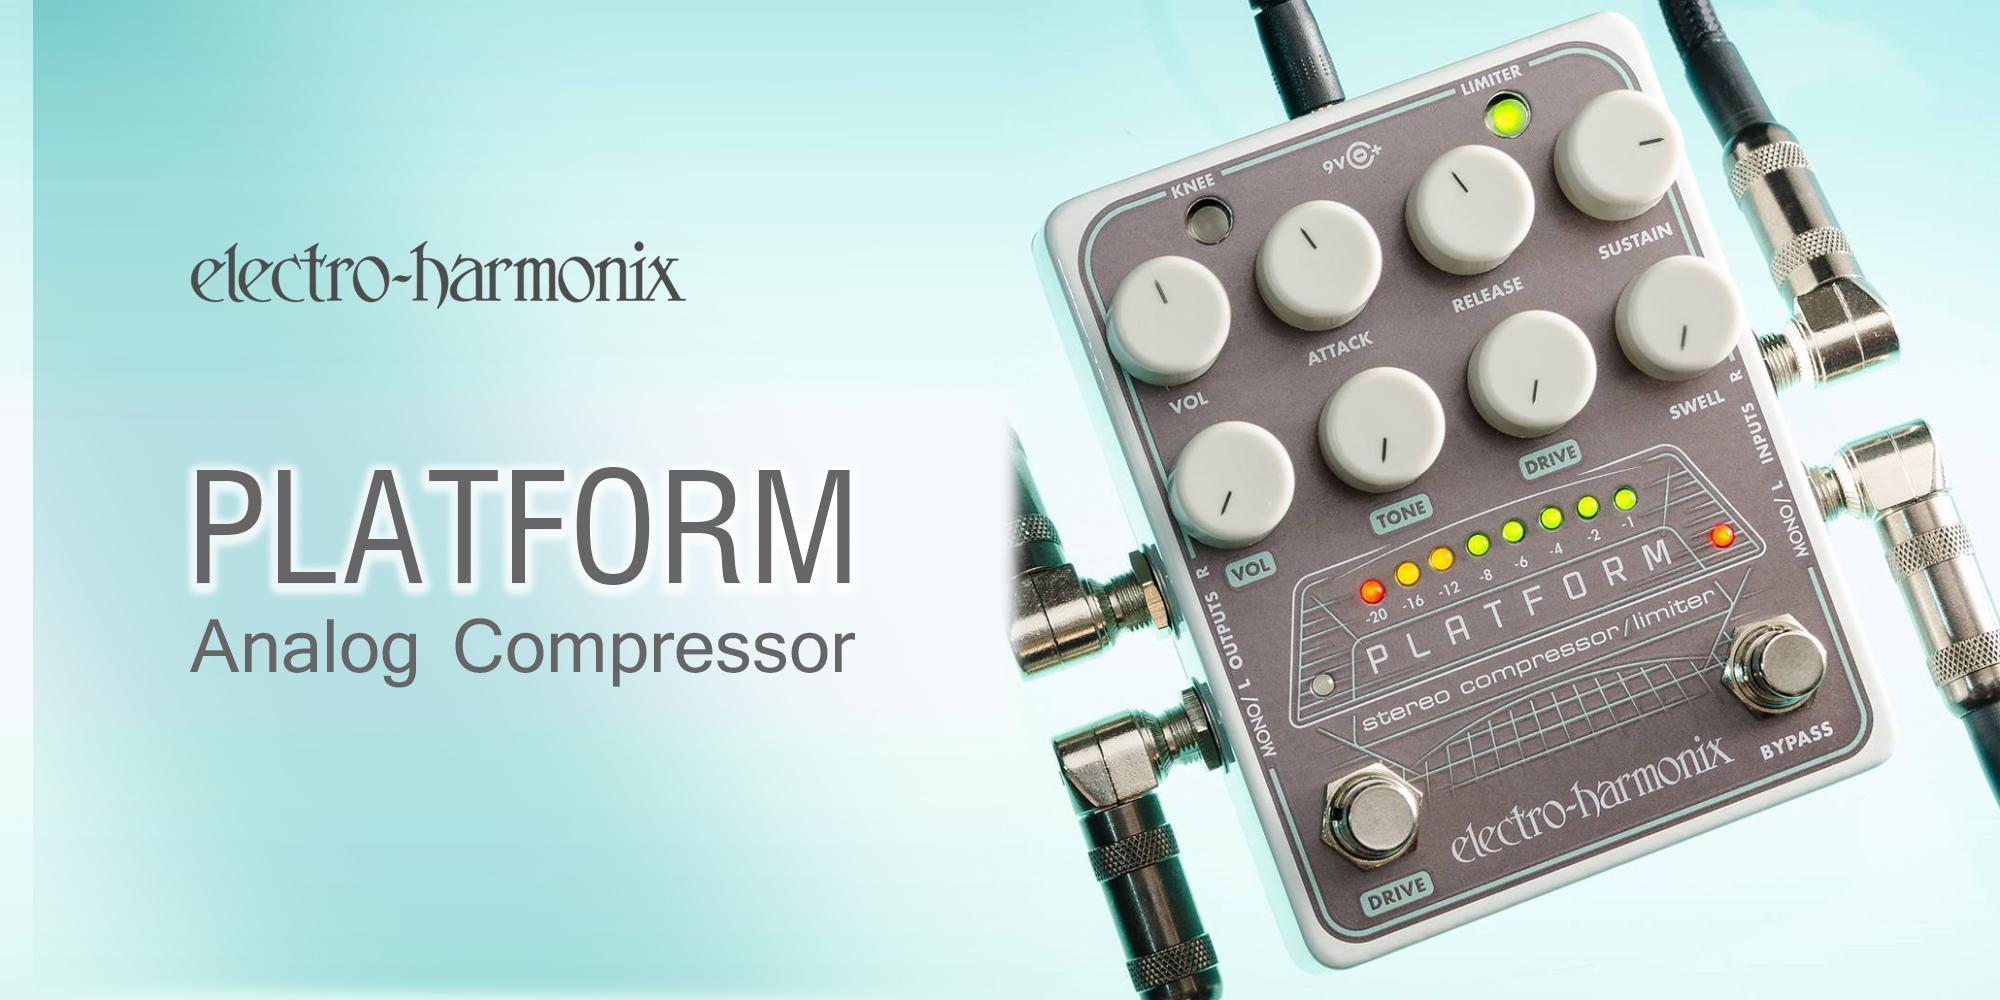 Electro-Harmonix 新製品 Platform リリース!